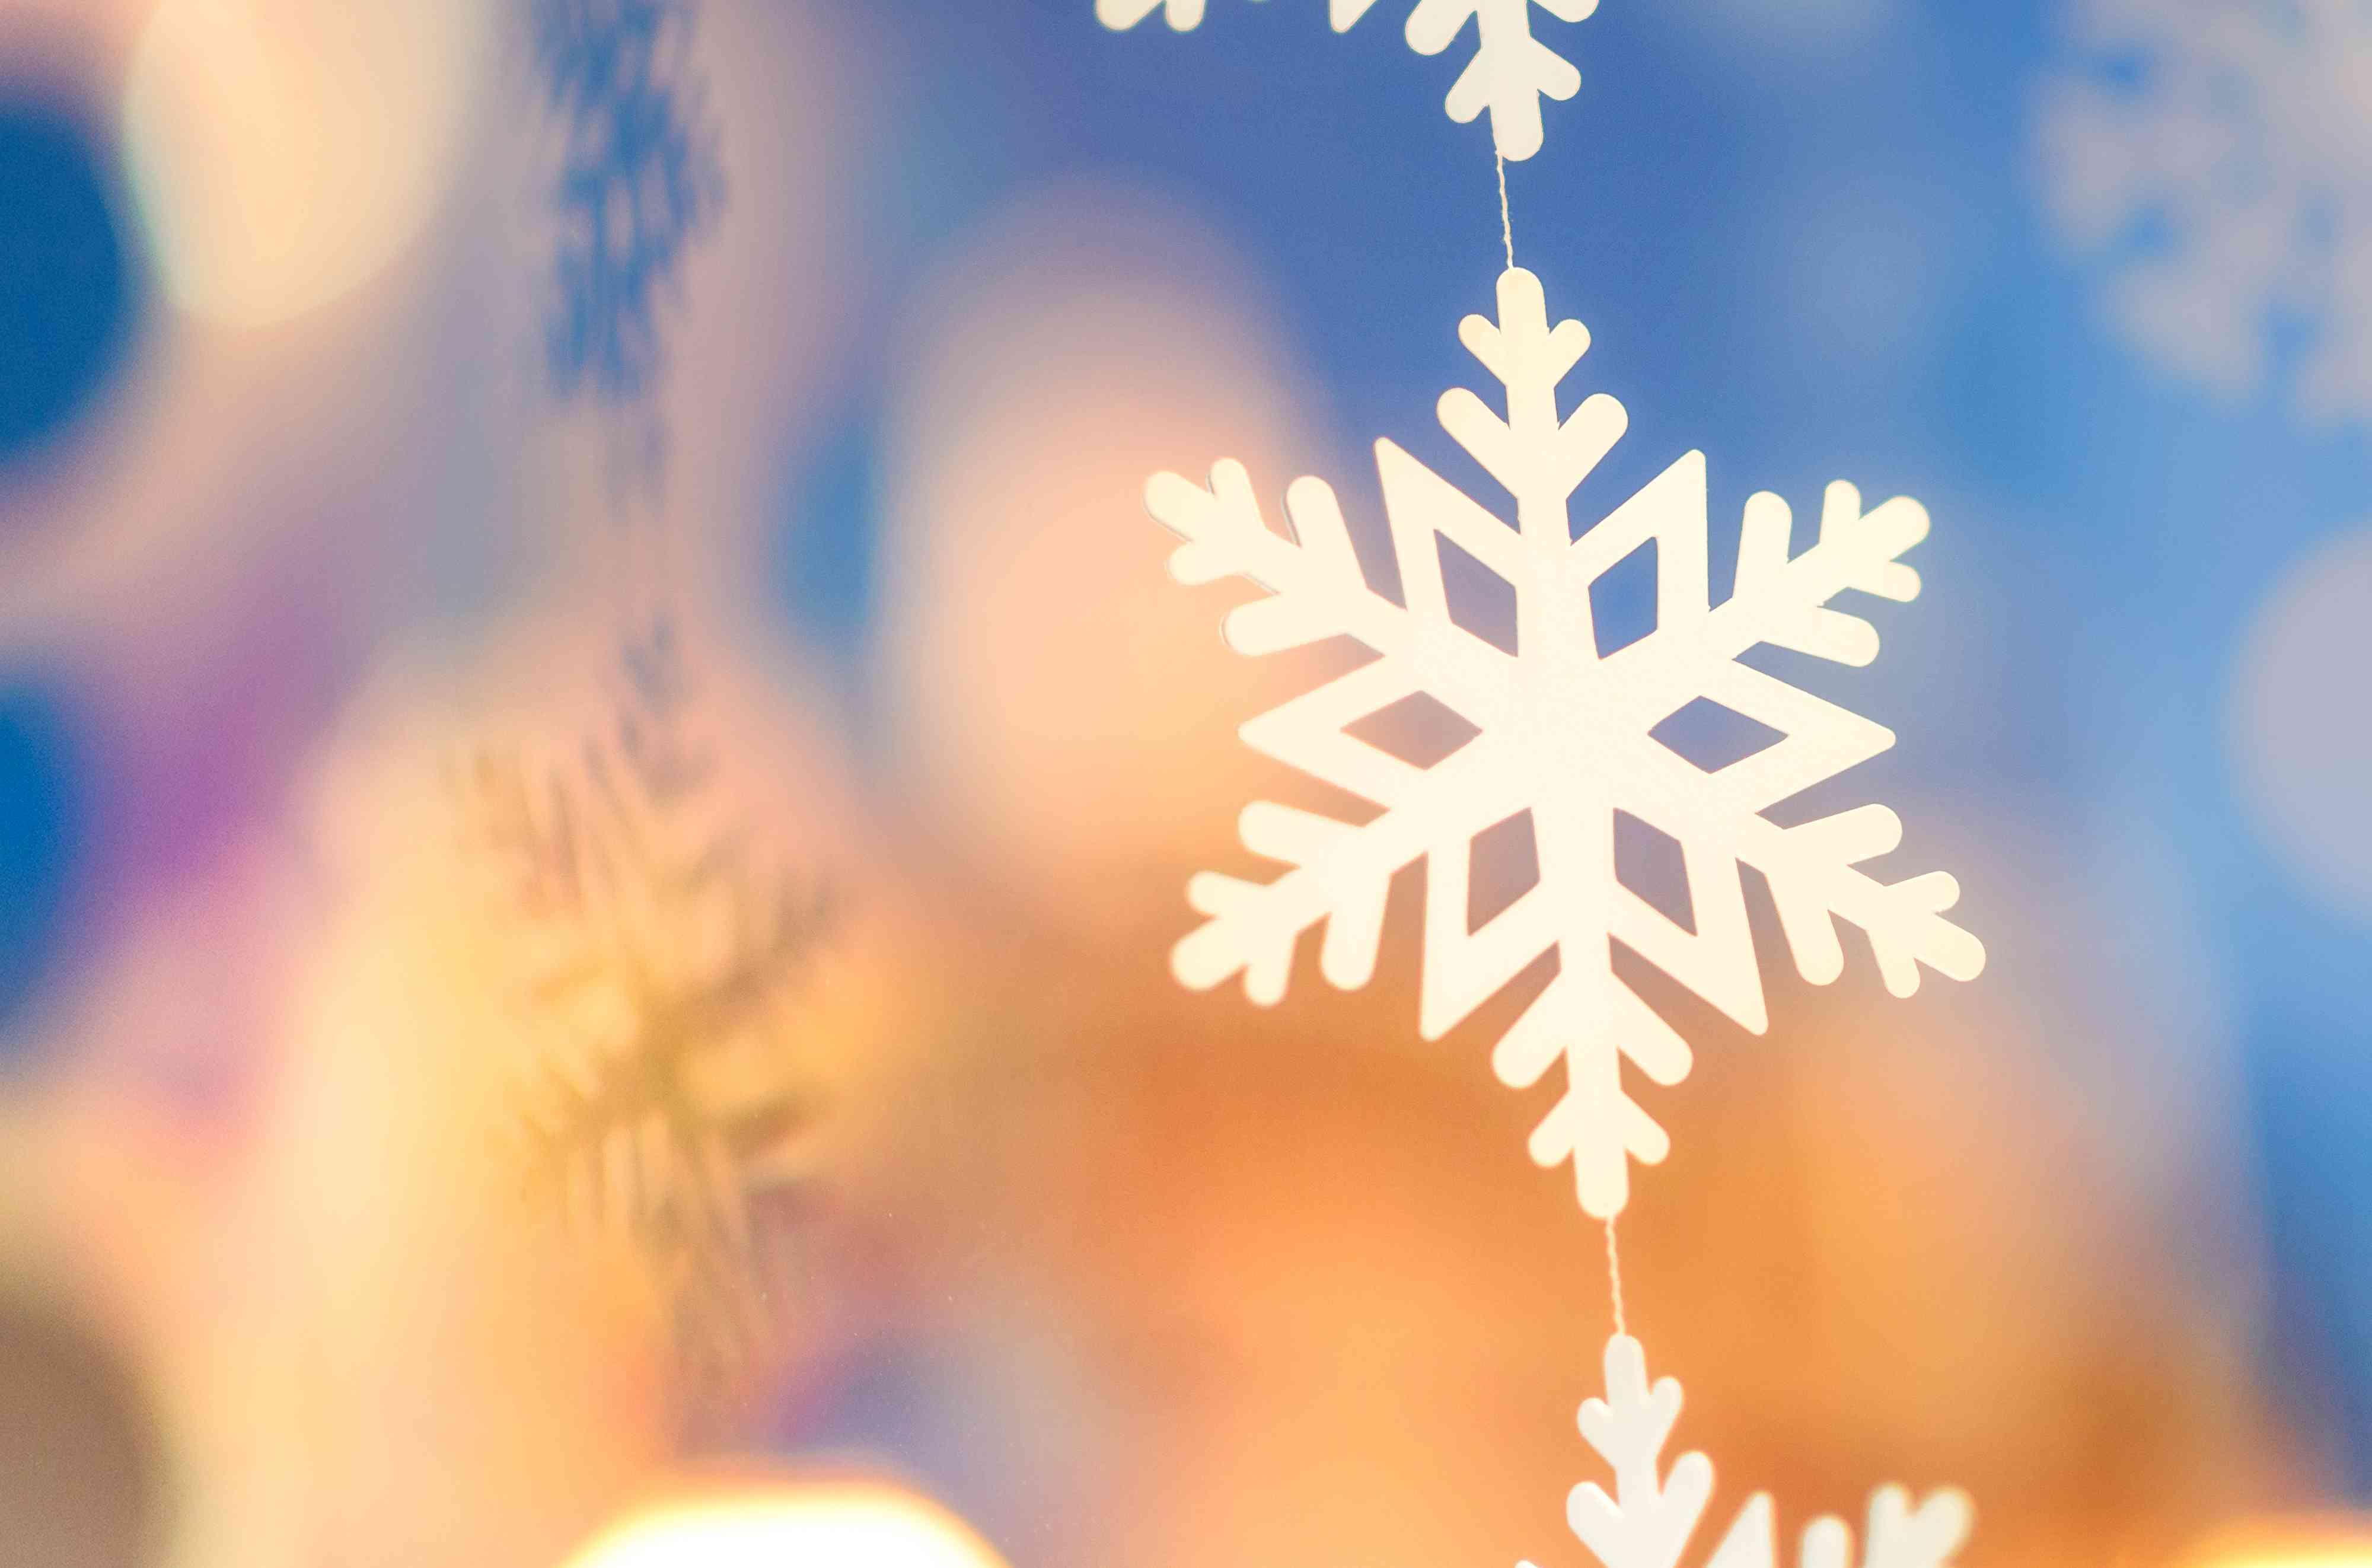 Close-up of snowflake decoration, Union Street, San Francisco, California, USA